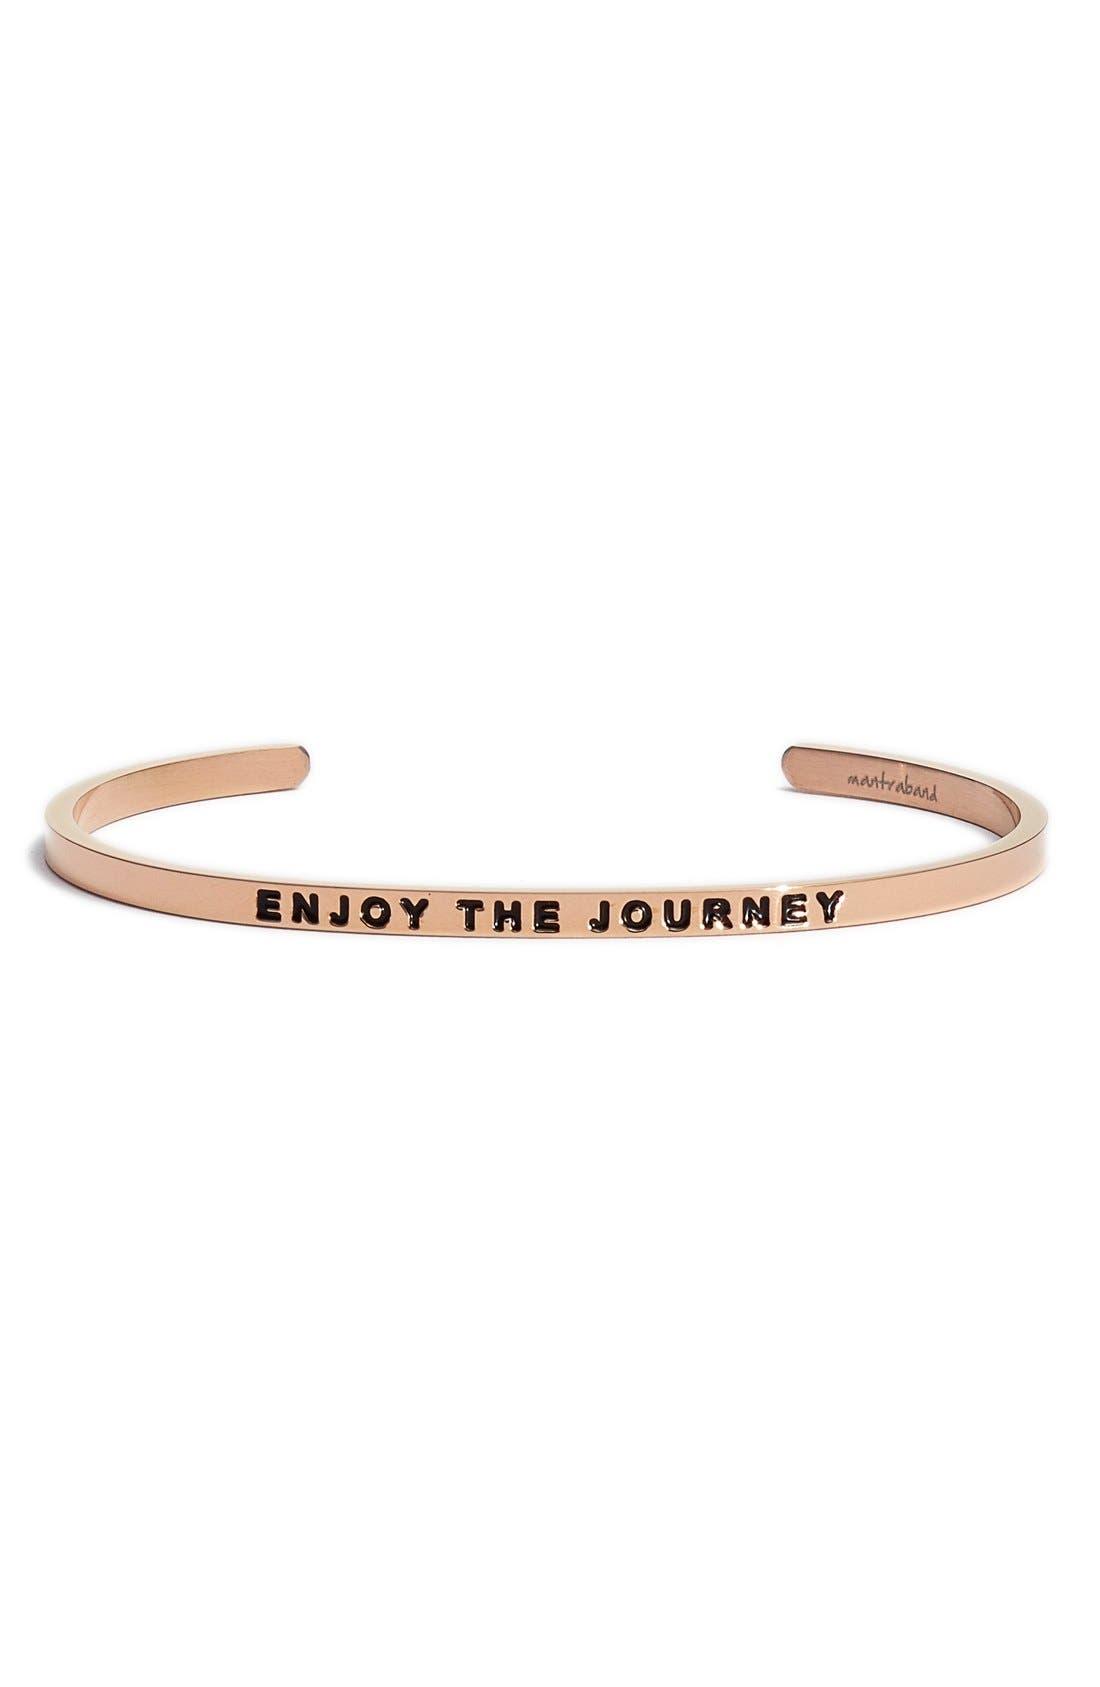 MANTRABAND 'Enjoy the Journey' Cuff